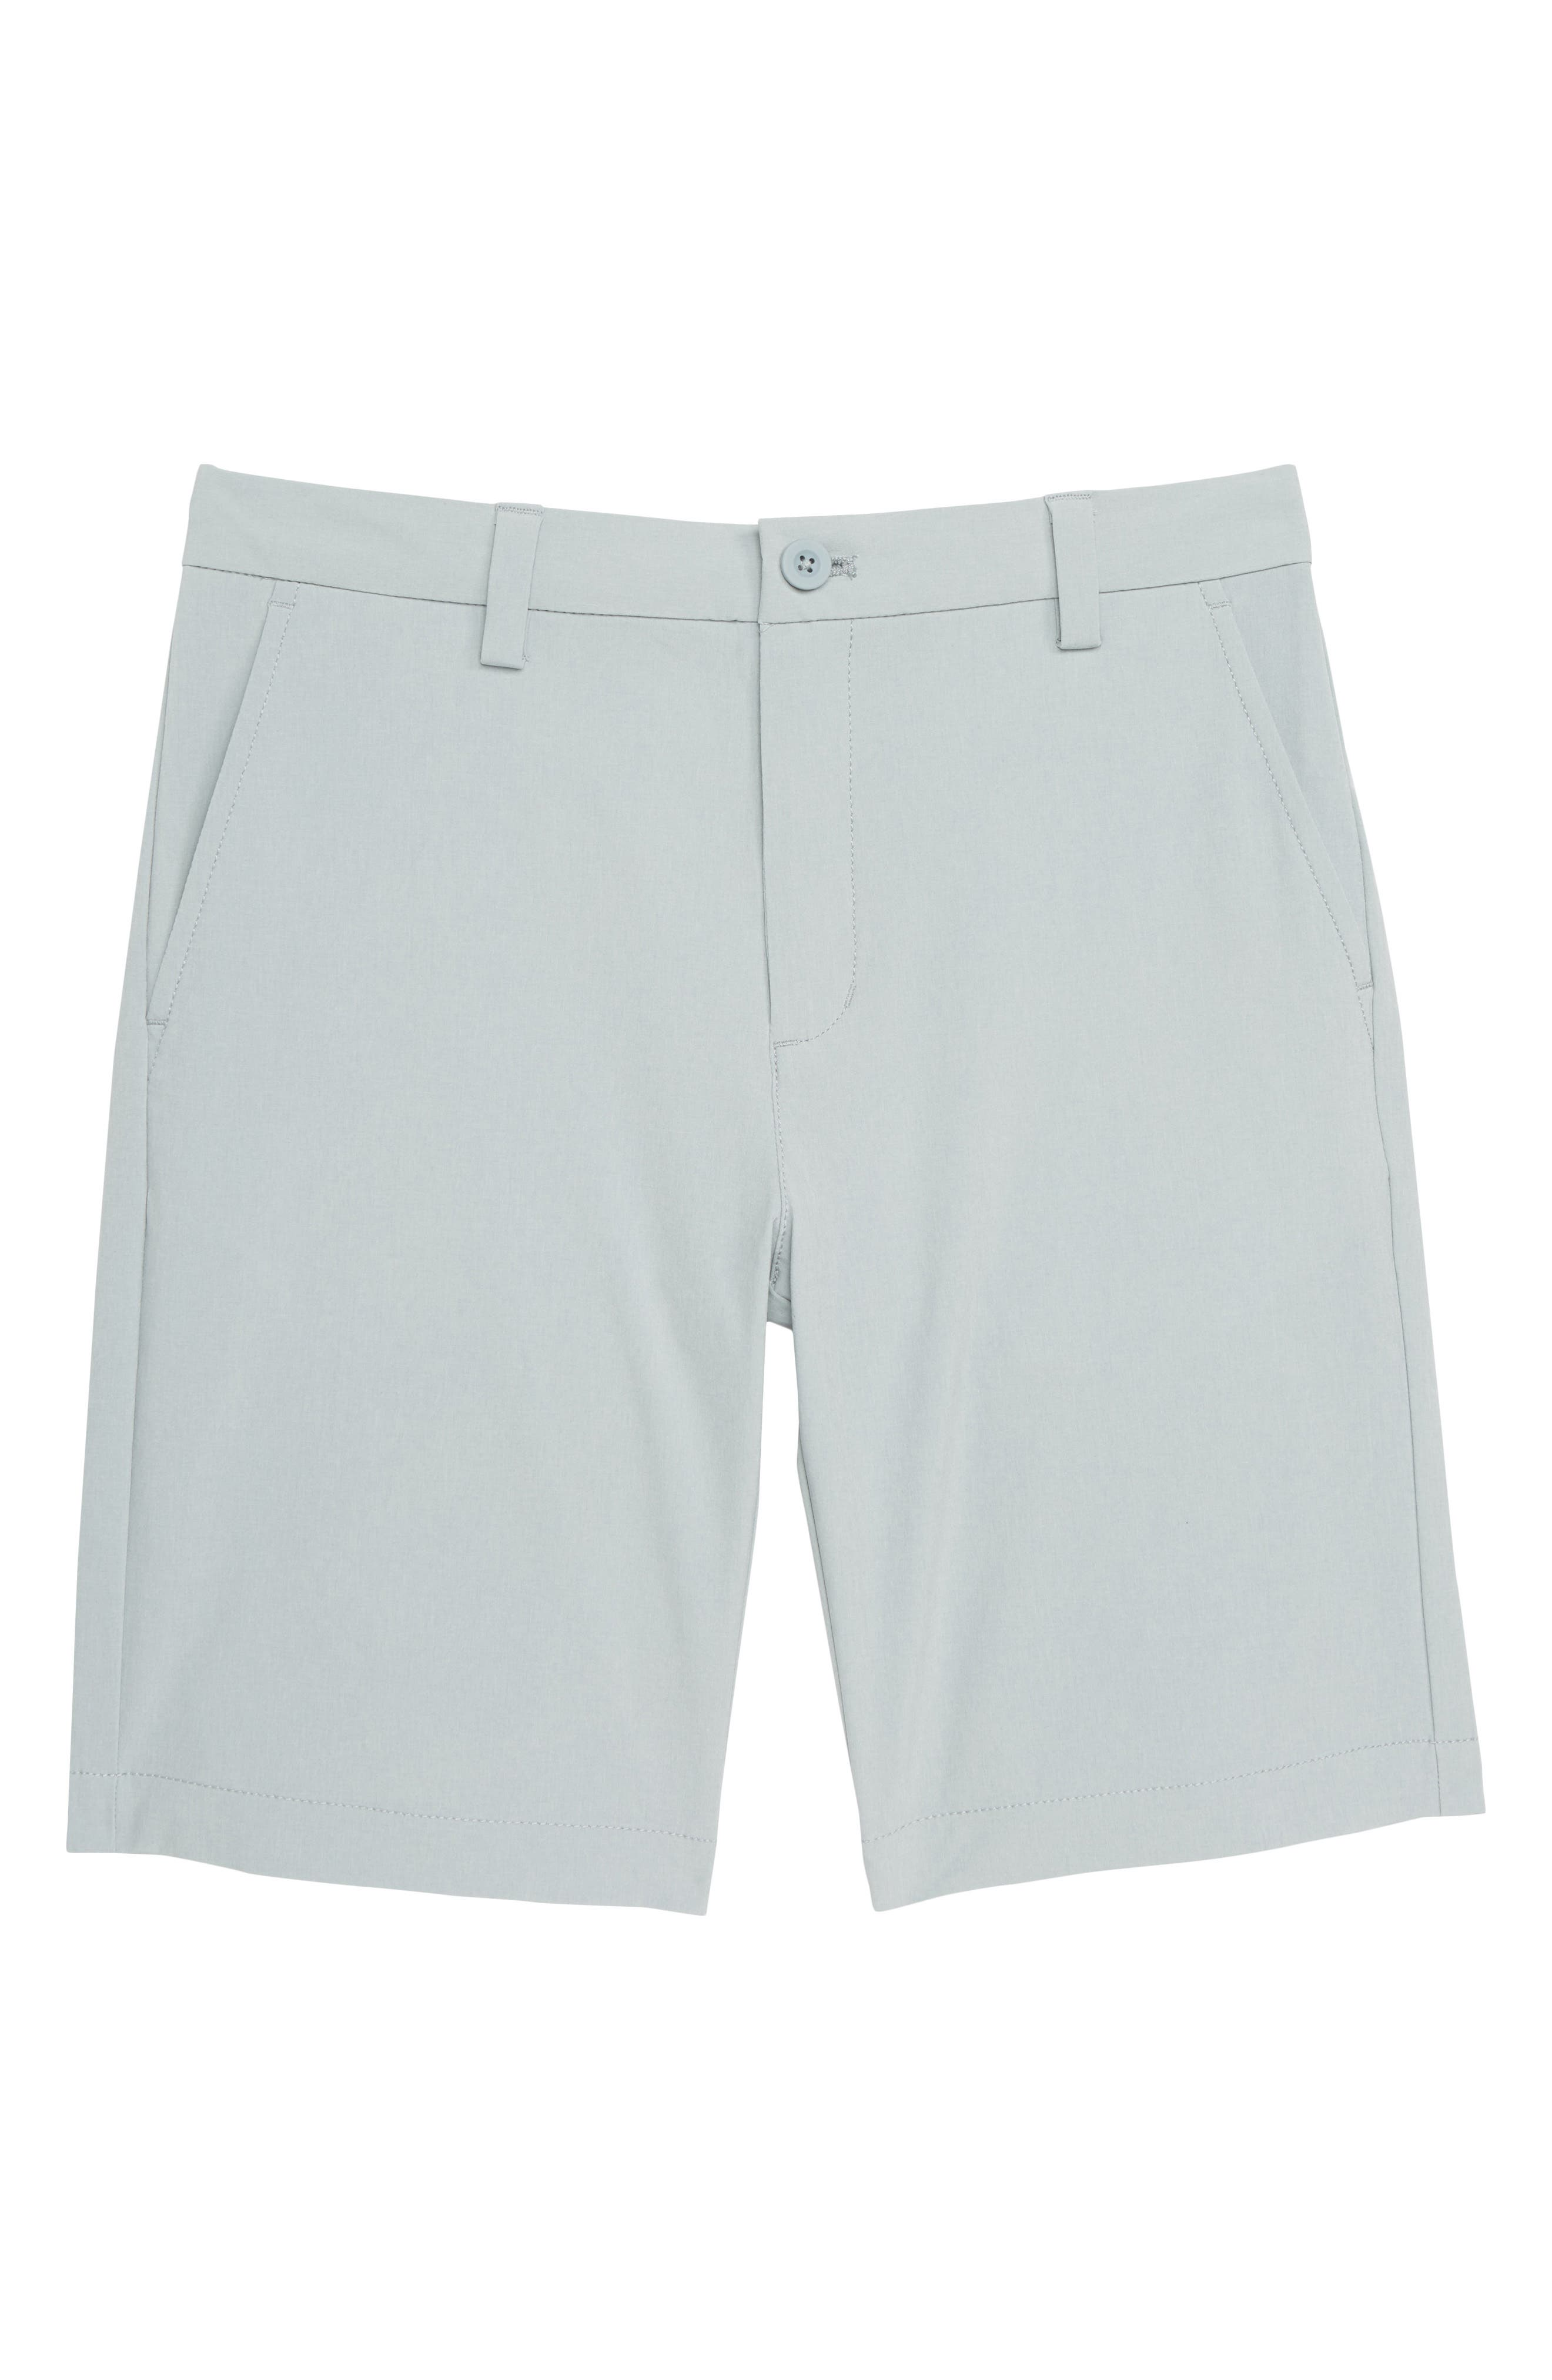 Performance Breaker Shorts,                         Main,                         color, BARRACUDA